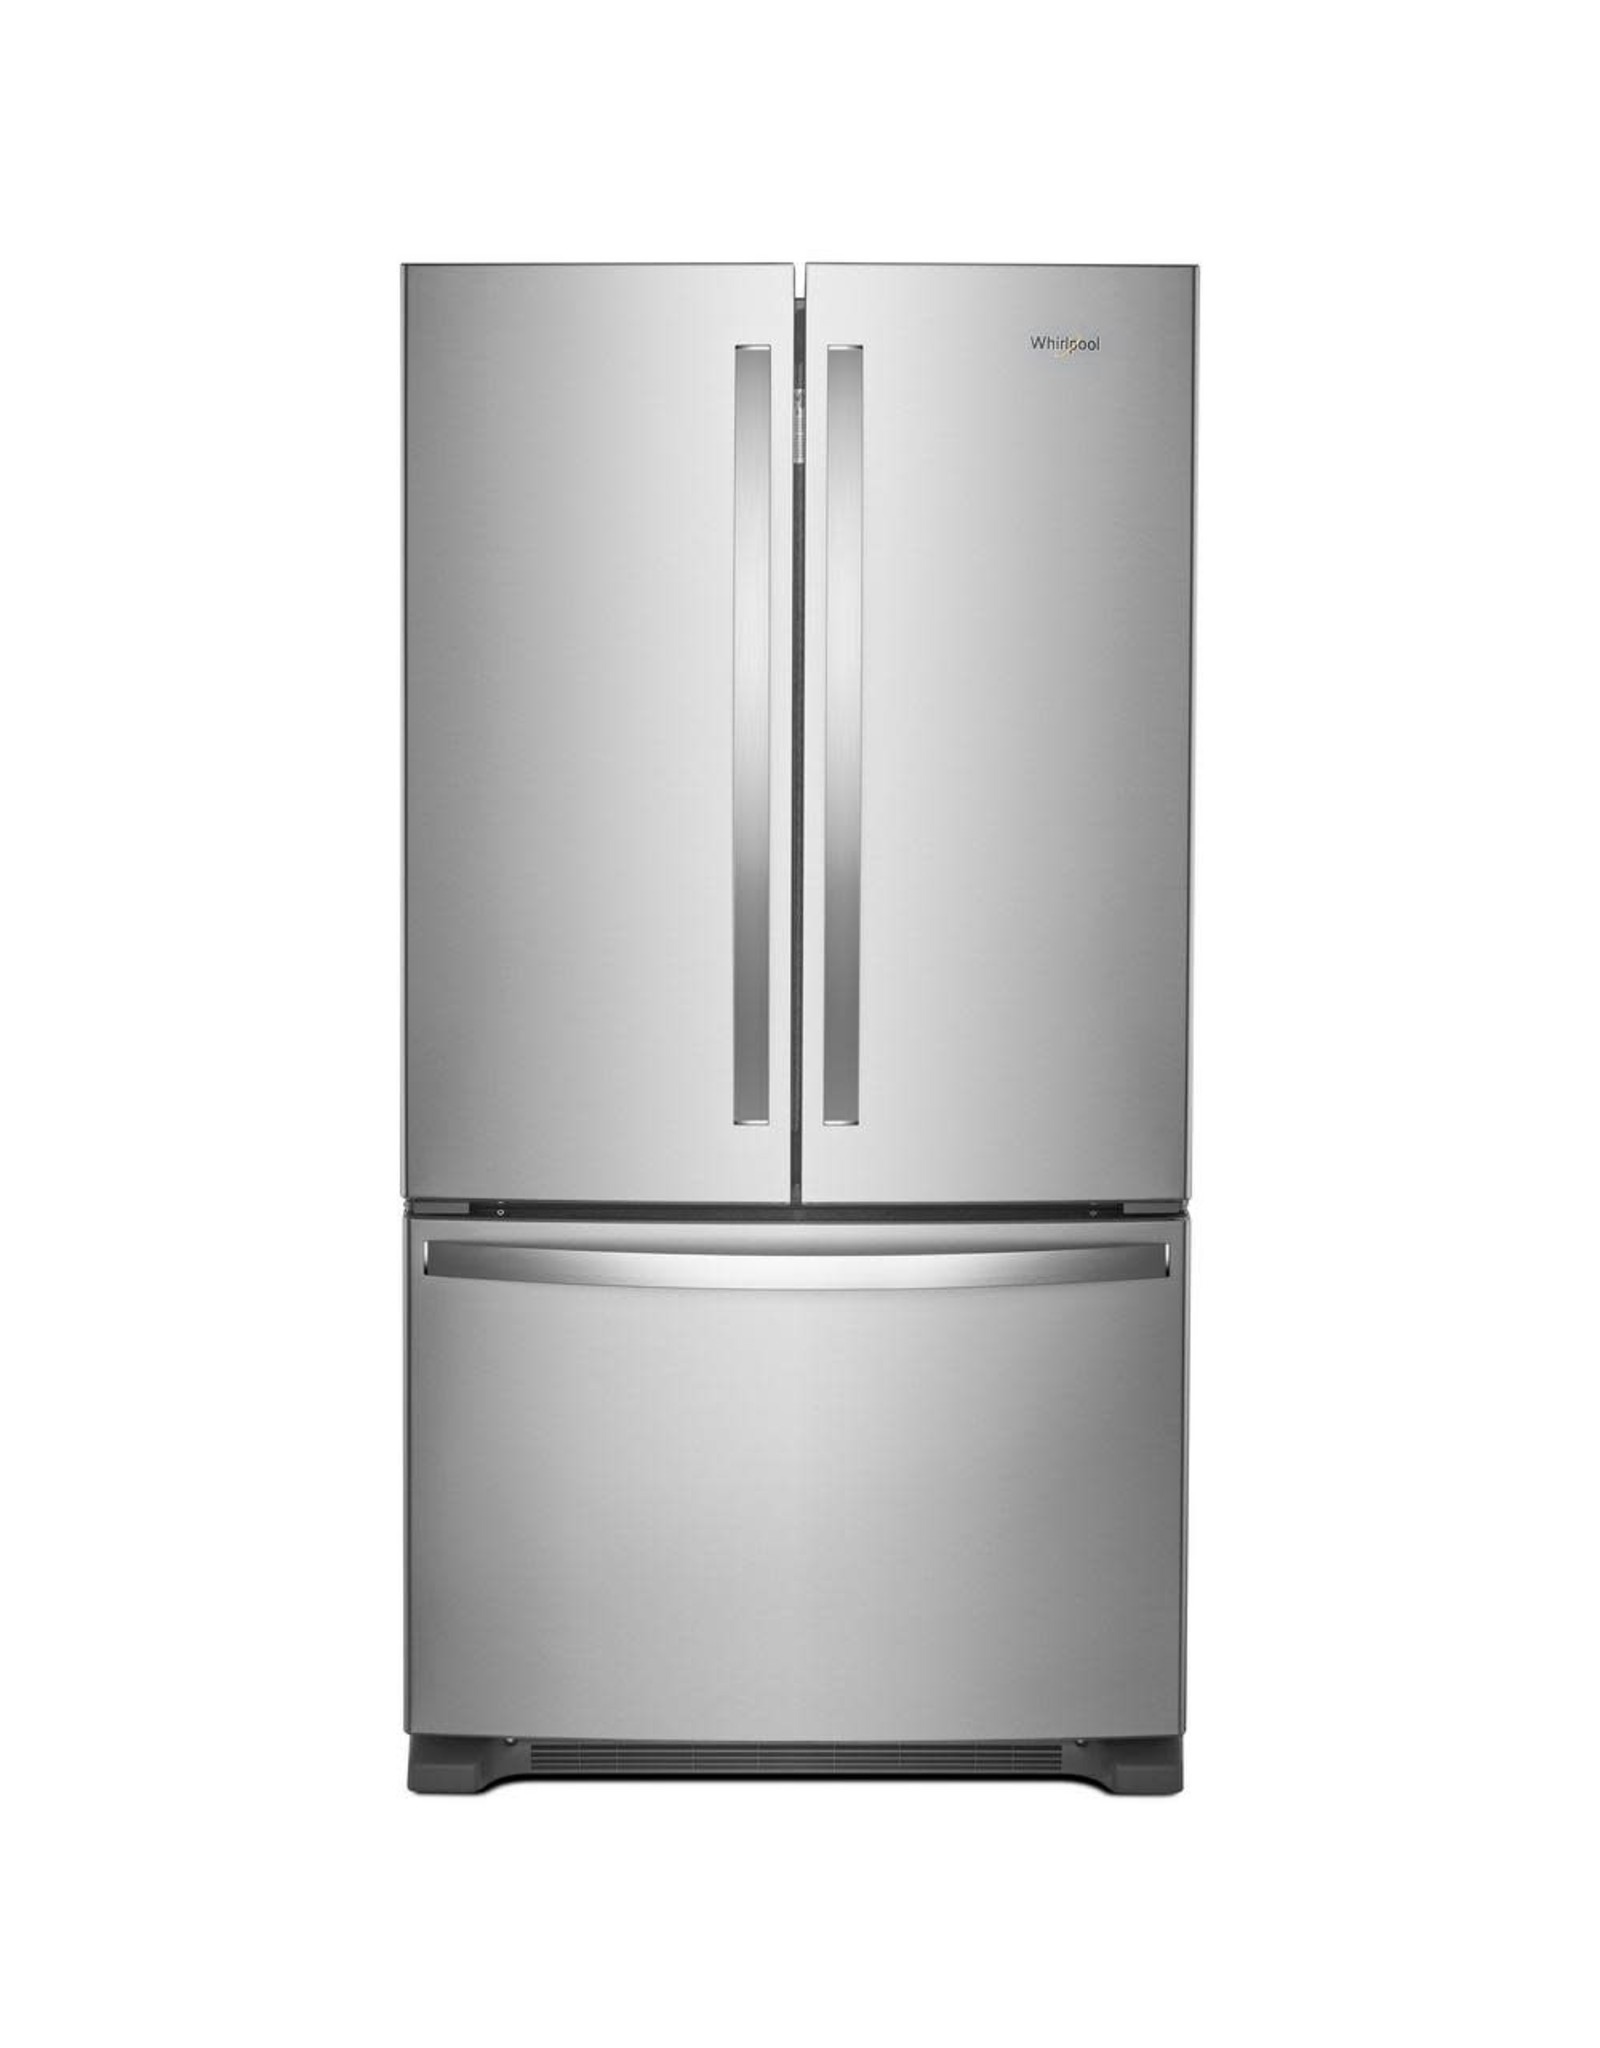 WHIRLPOOL 25 cu. ft. French Door Refrigerator in Fingerprint Resistant Stainless Steel with Internal Water Dispenser